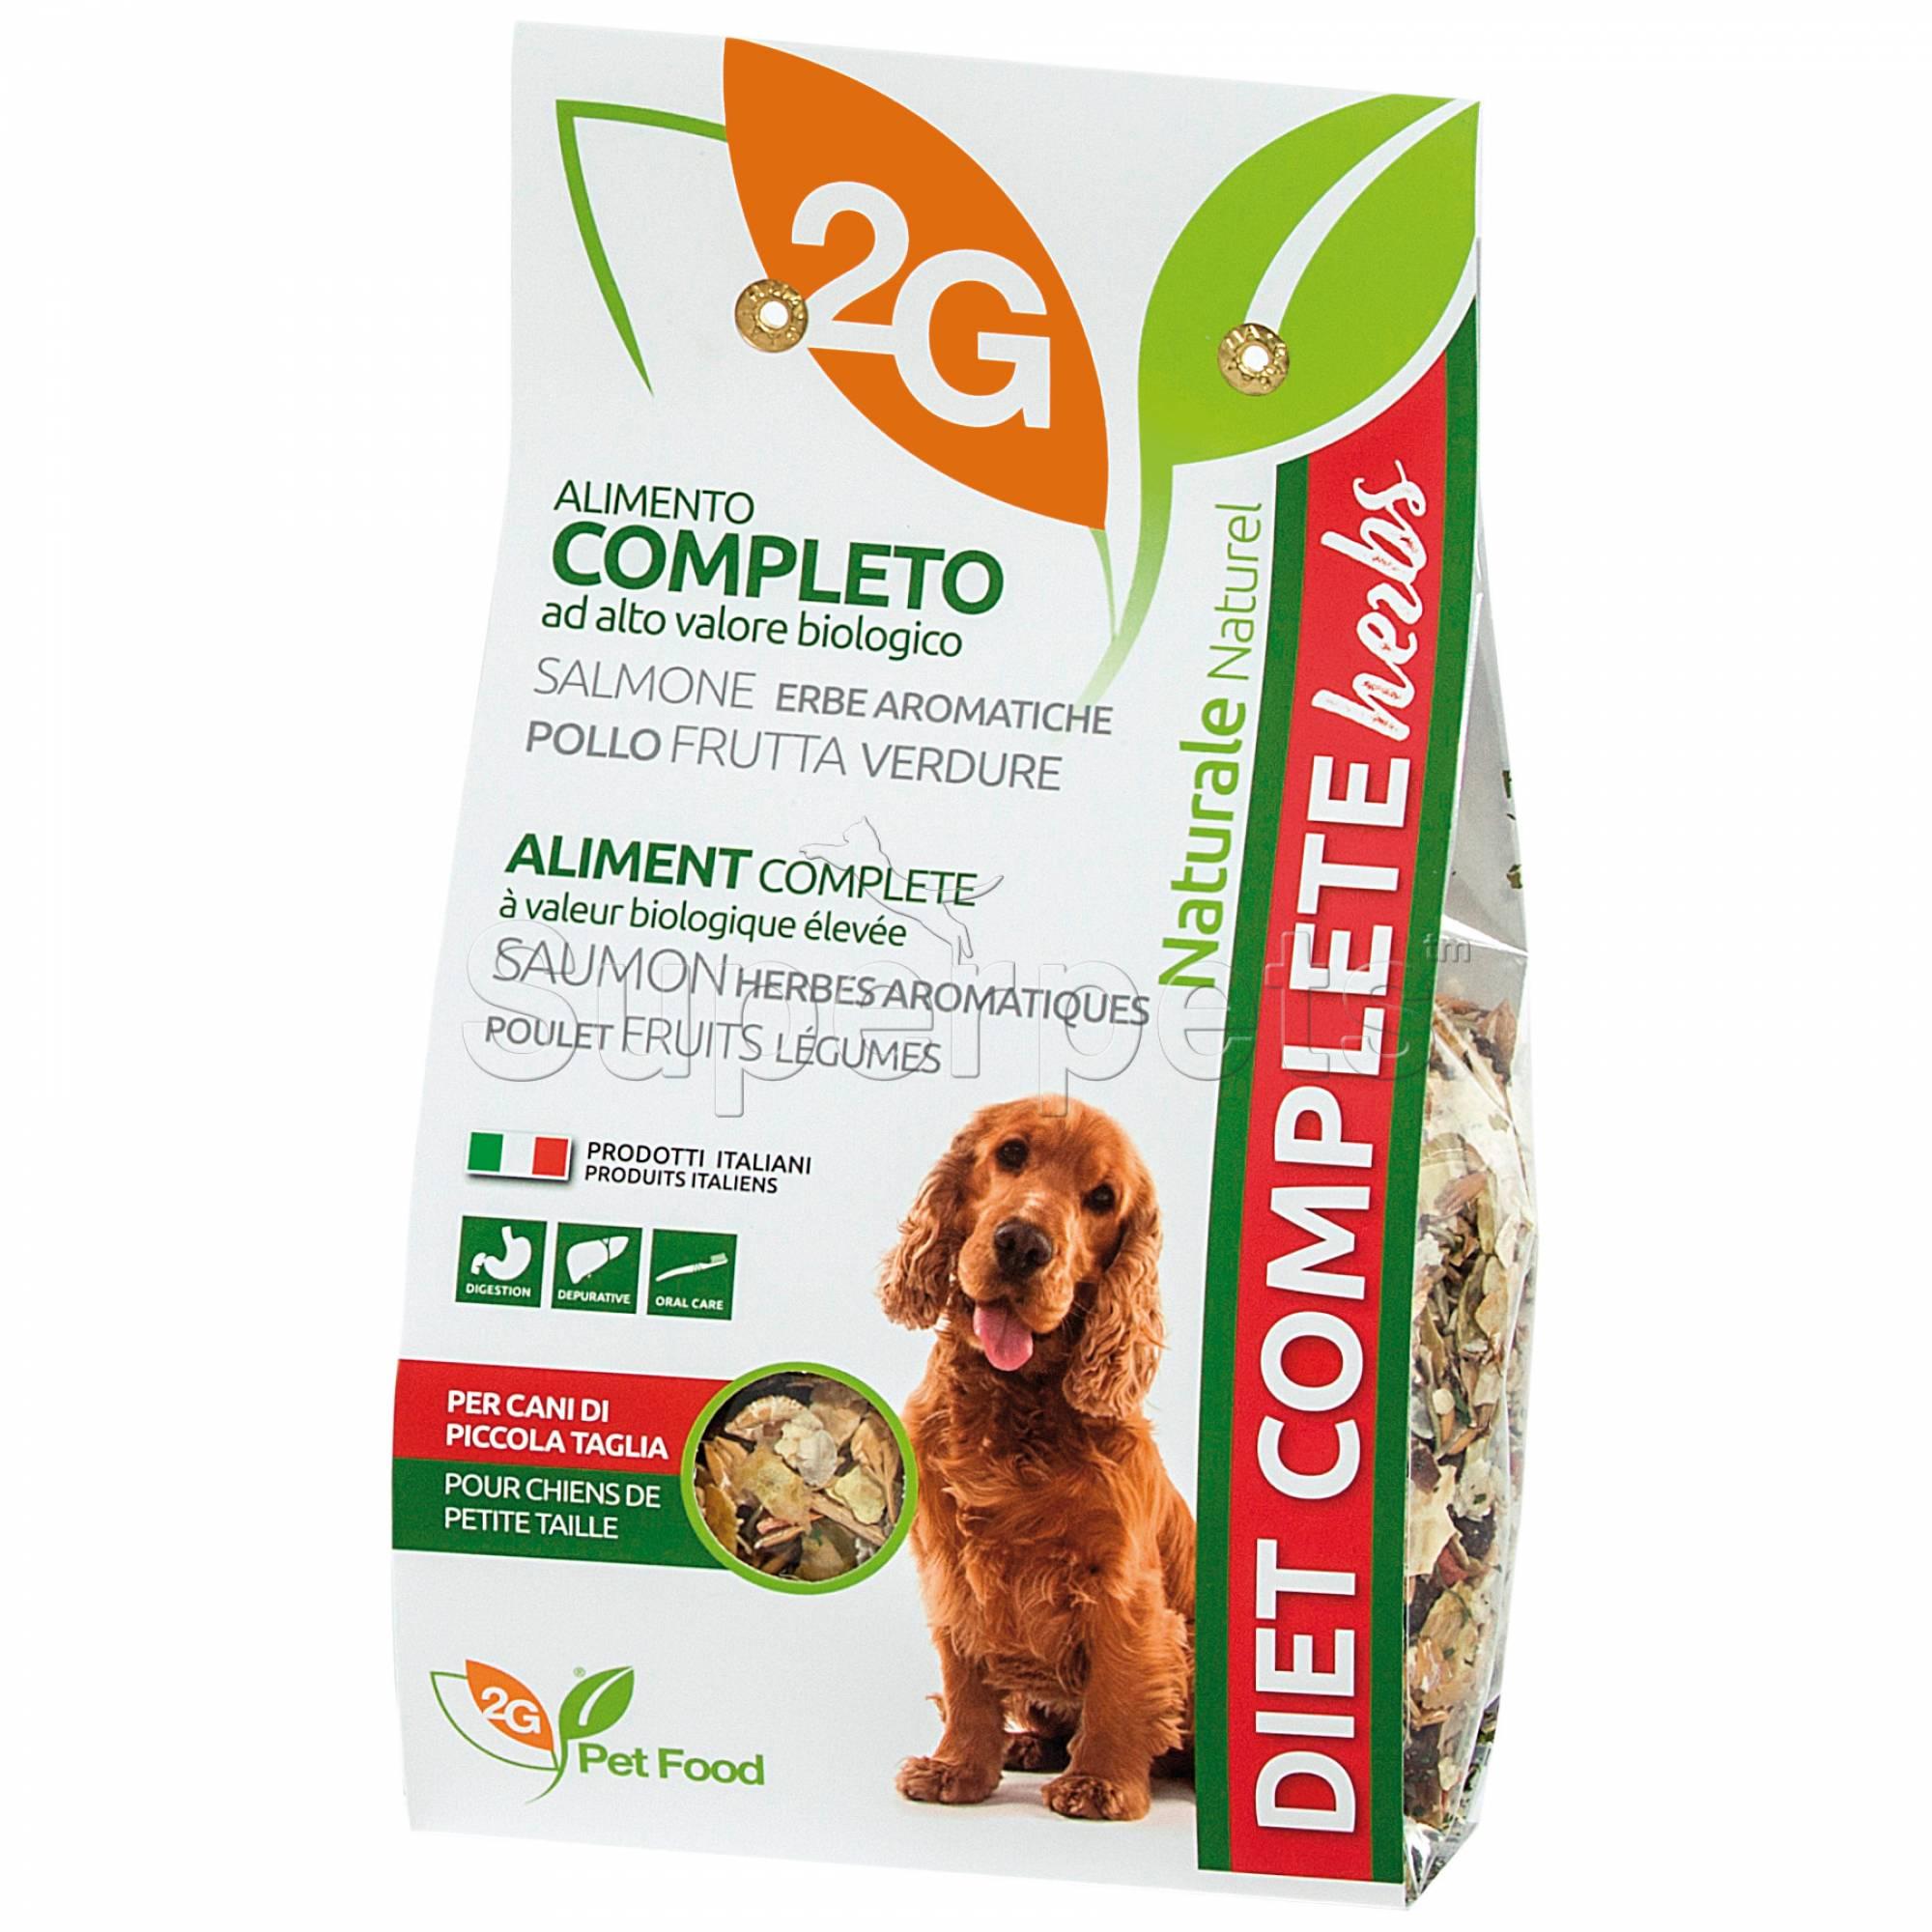 2G Pet Food - Diet Complete Herbs 350g